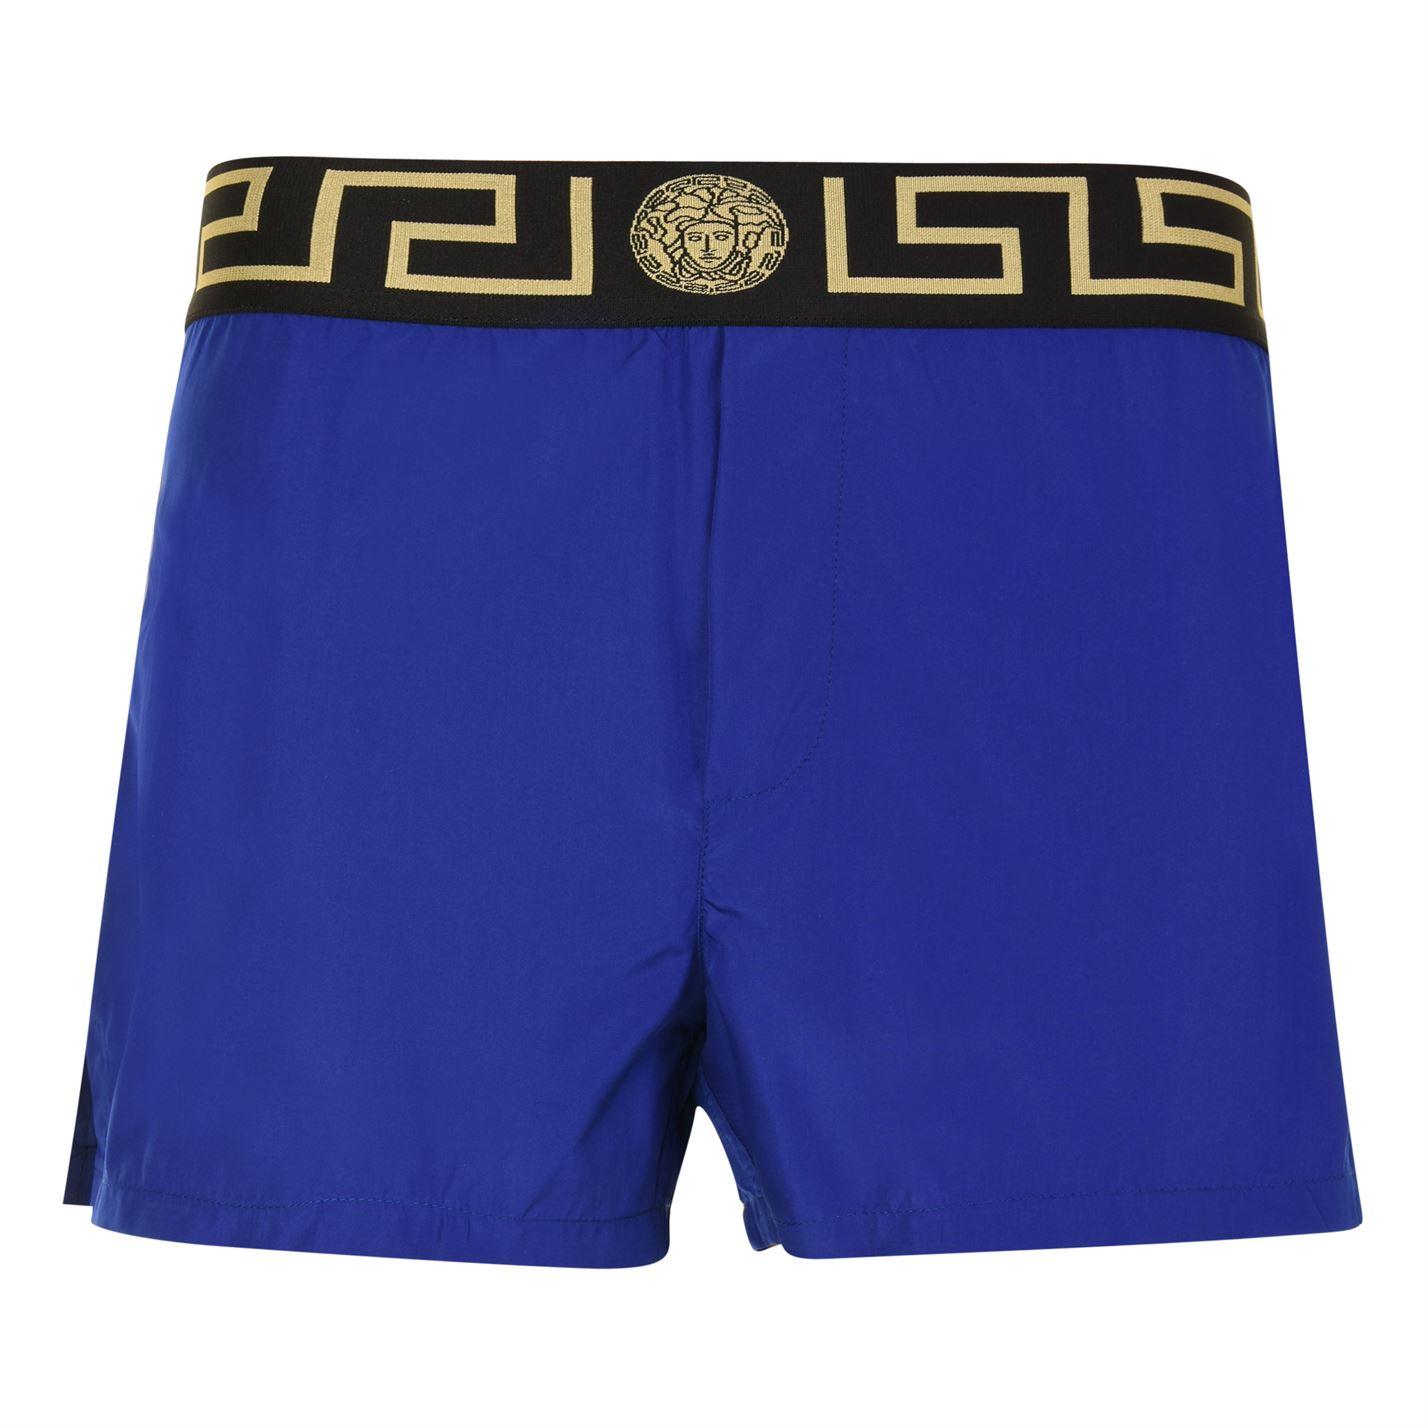 49539c020cd50 VERSACE ICON Greca Waistband Swim Shorts Blue/Gold A856L - Jeftinije.hr